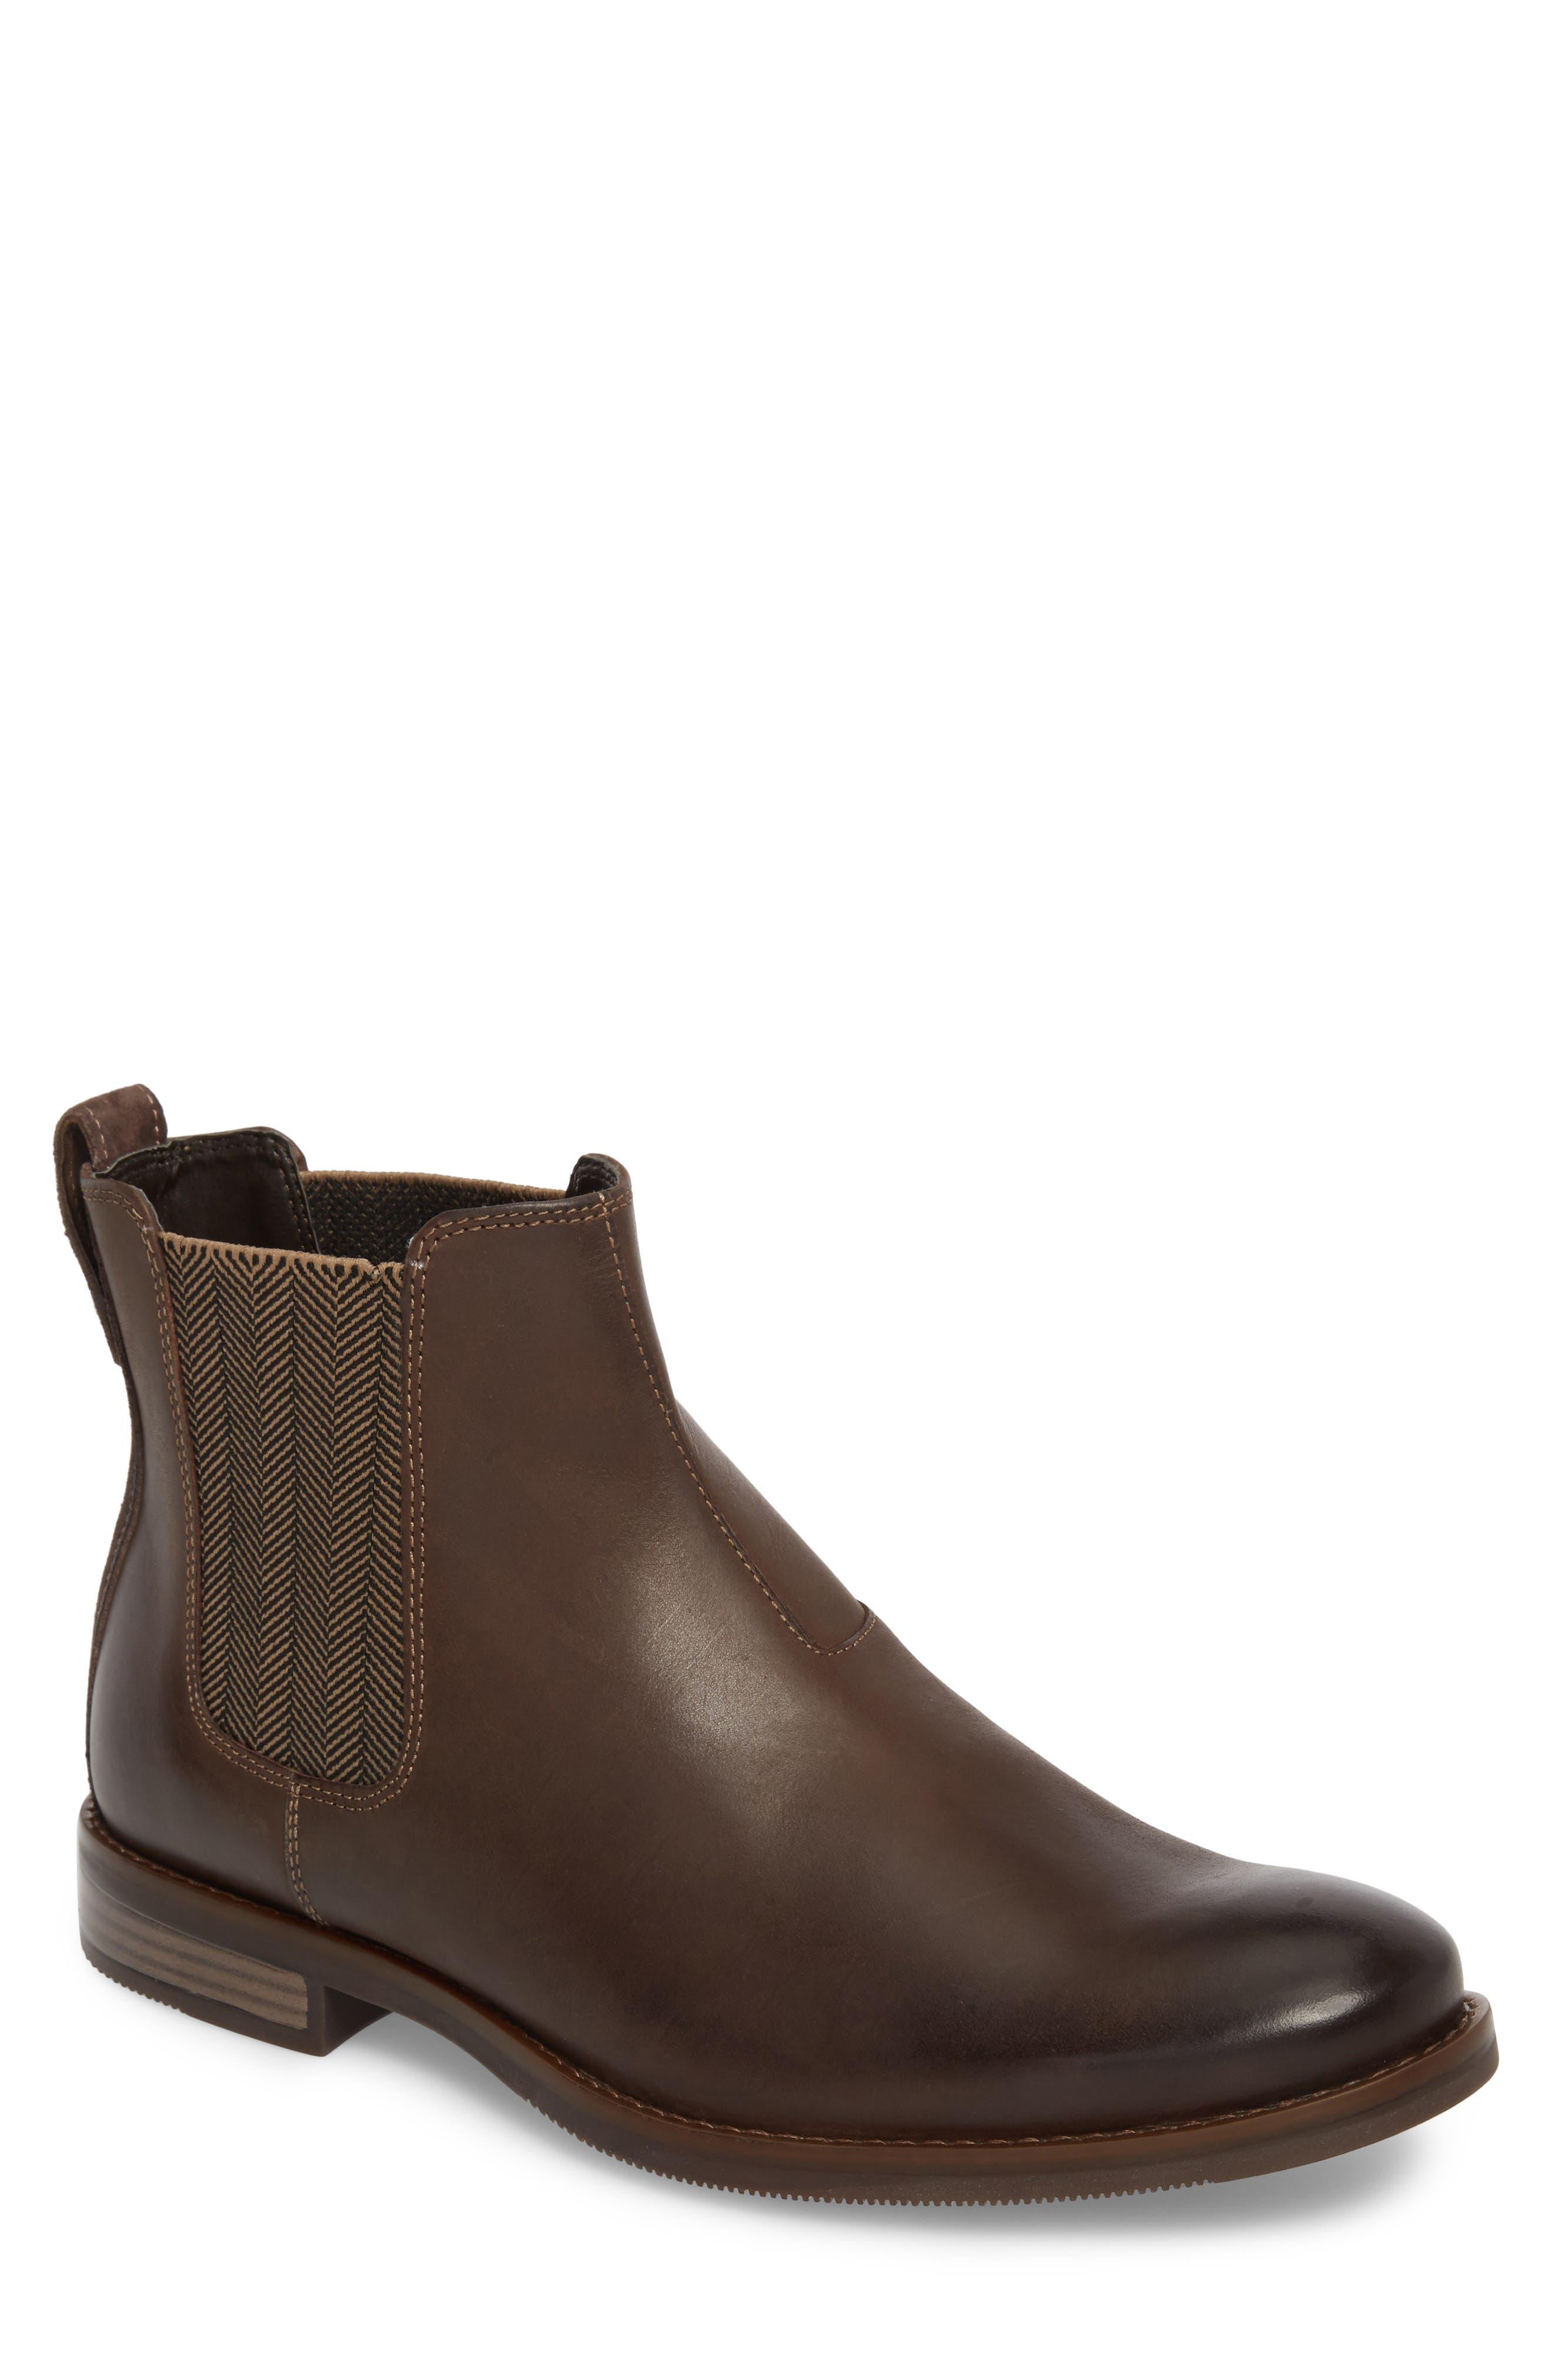 Main Image - Rockport Wynstin Chelsea Boot (Men)